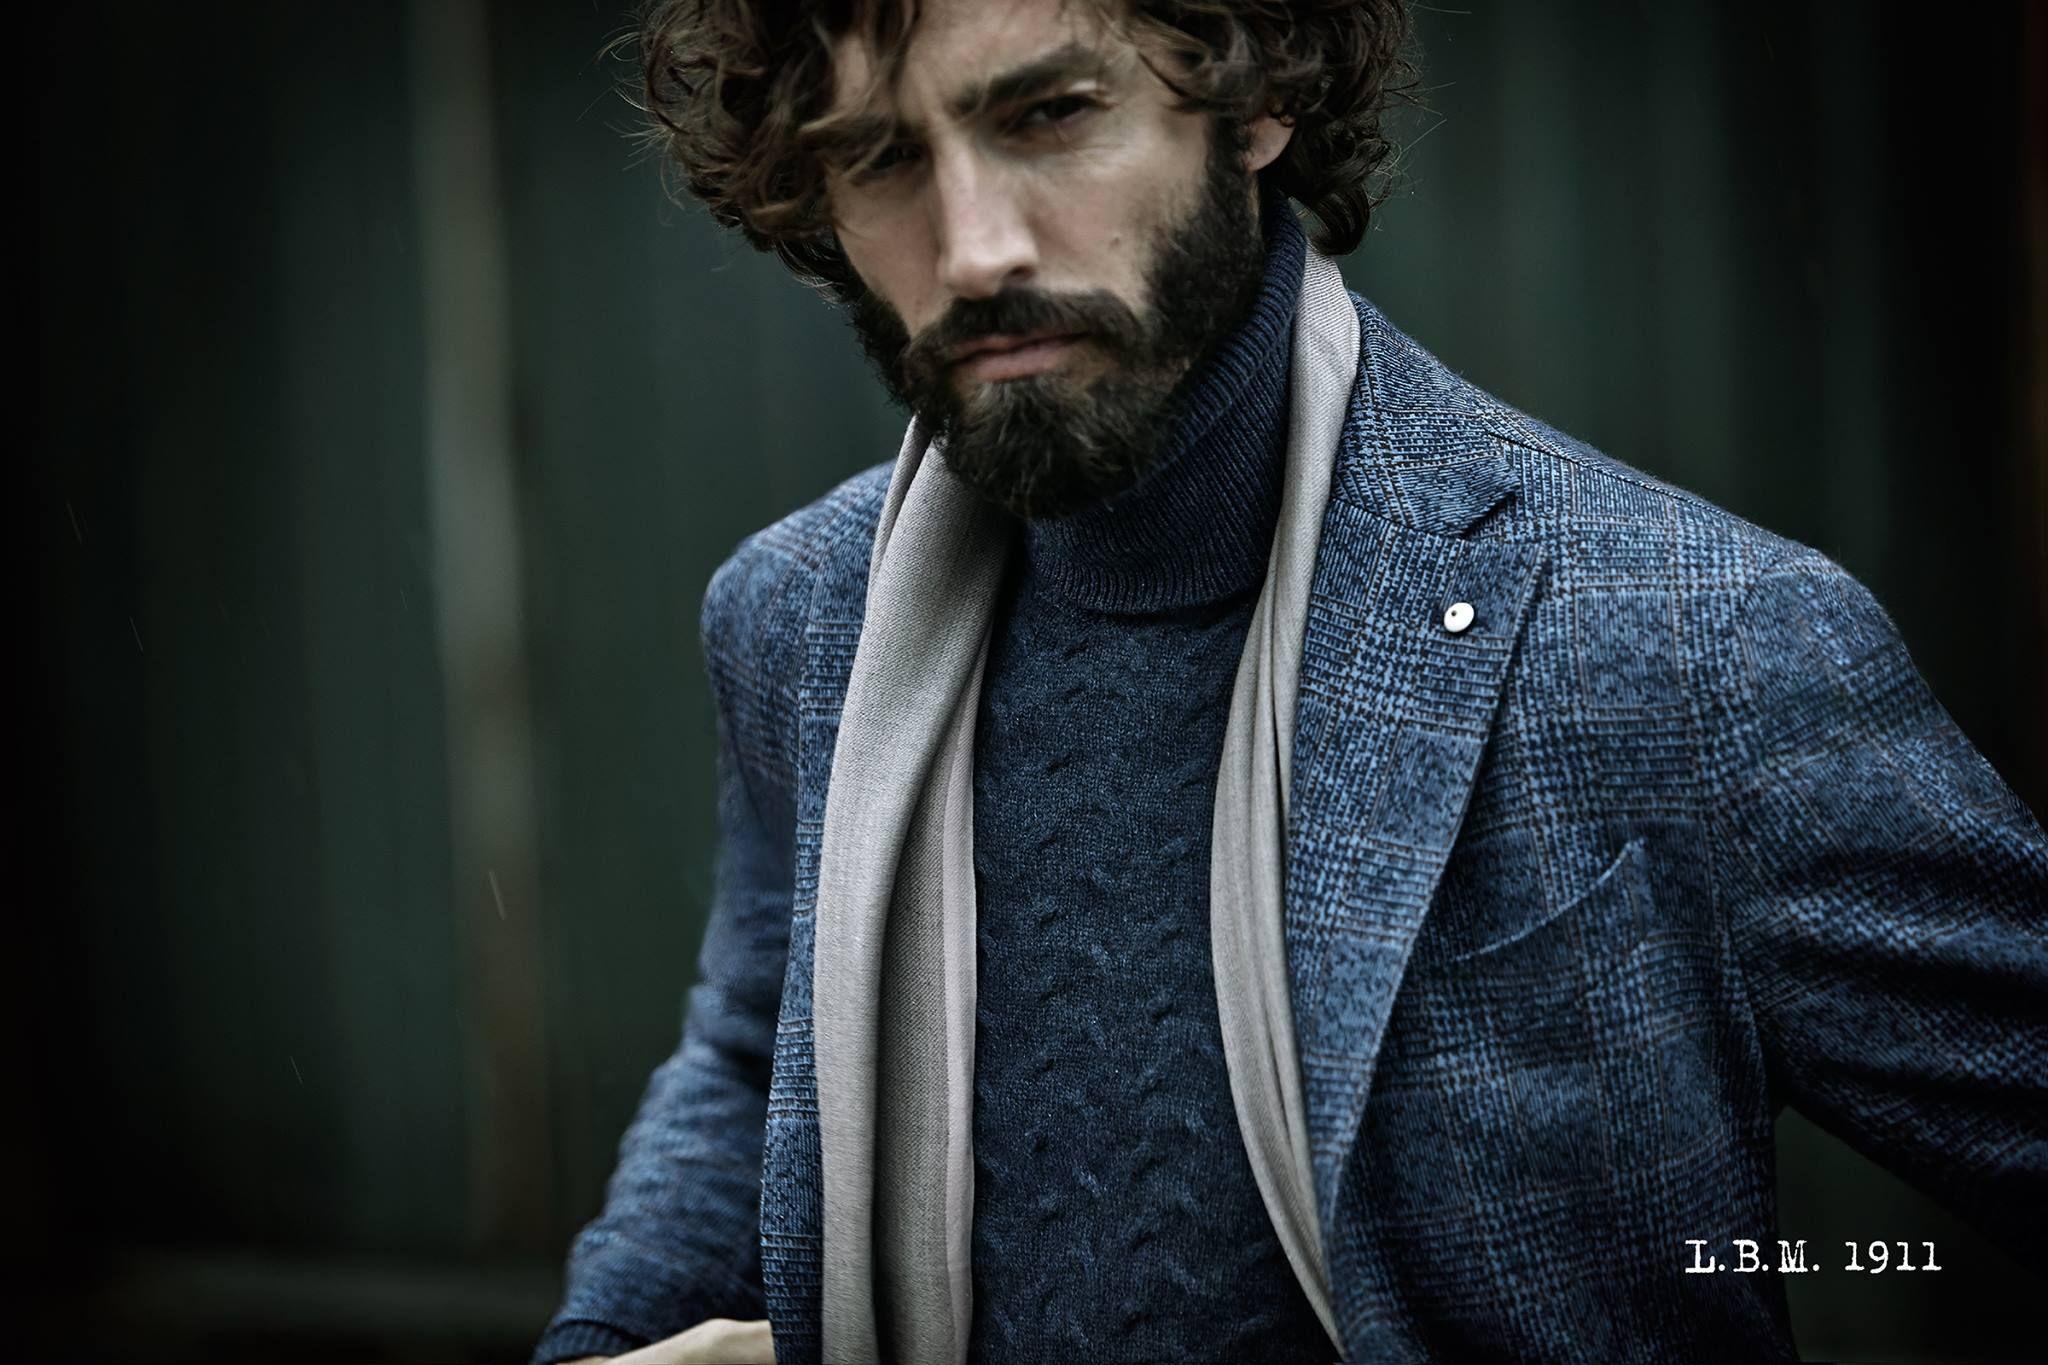 L.B.M.1911 Fall Winter 2015-16 Otoño Invierno #Menswear #Trends #Tendencias…